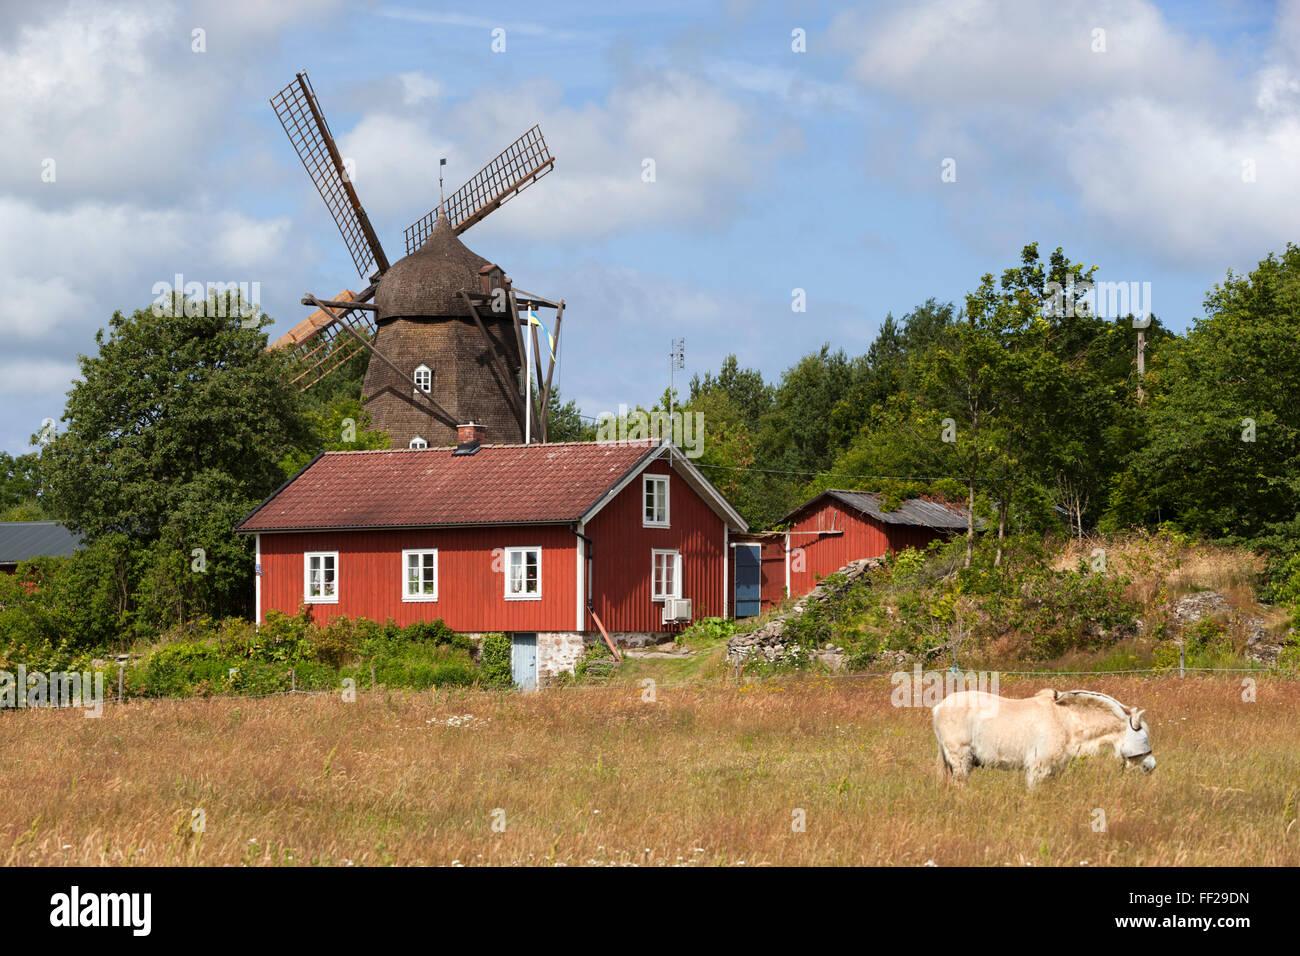 Sunvara Kvarn windmiRMRM, Sunvara, near Varobacka, HaRMRMand, Southwest Sweden, Sweden, Scandinavia, Europe - Stock Image